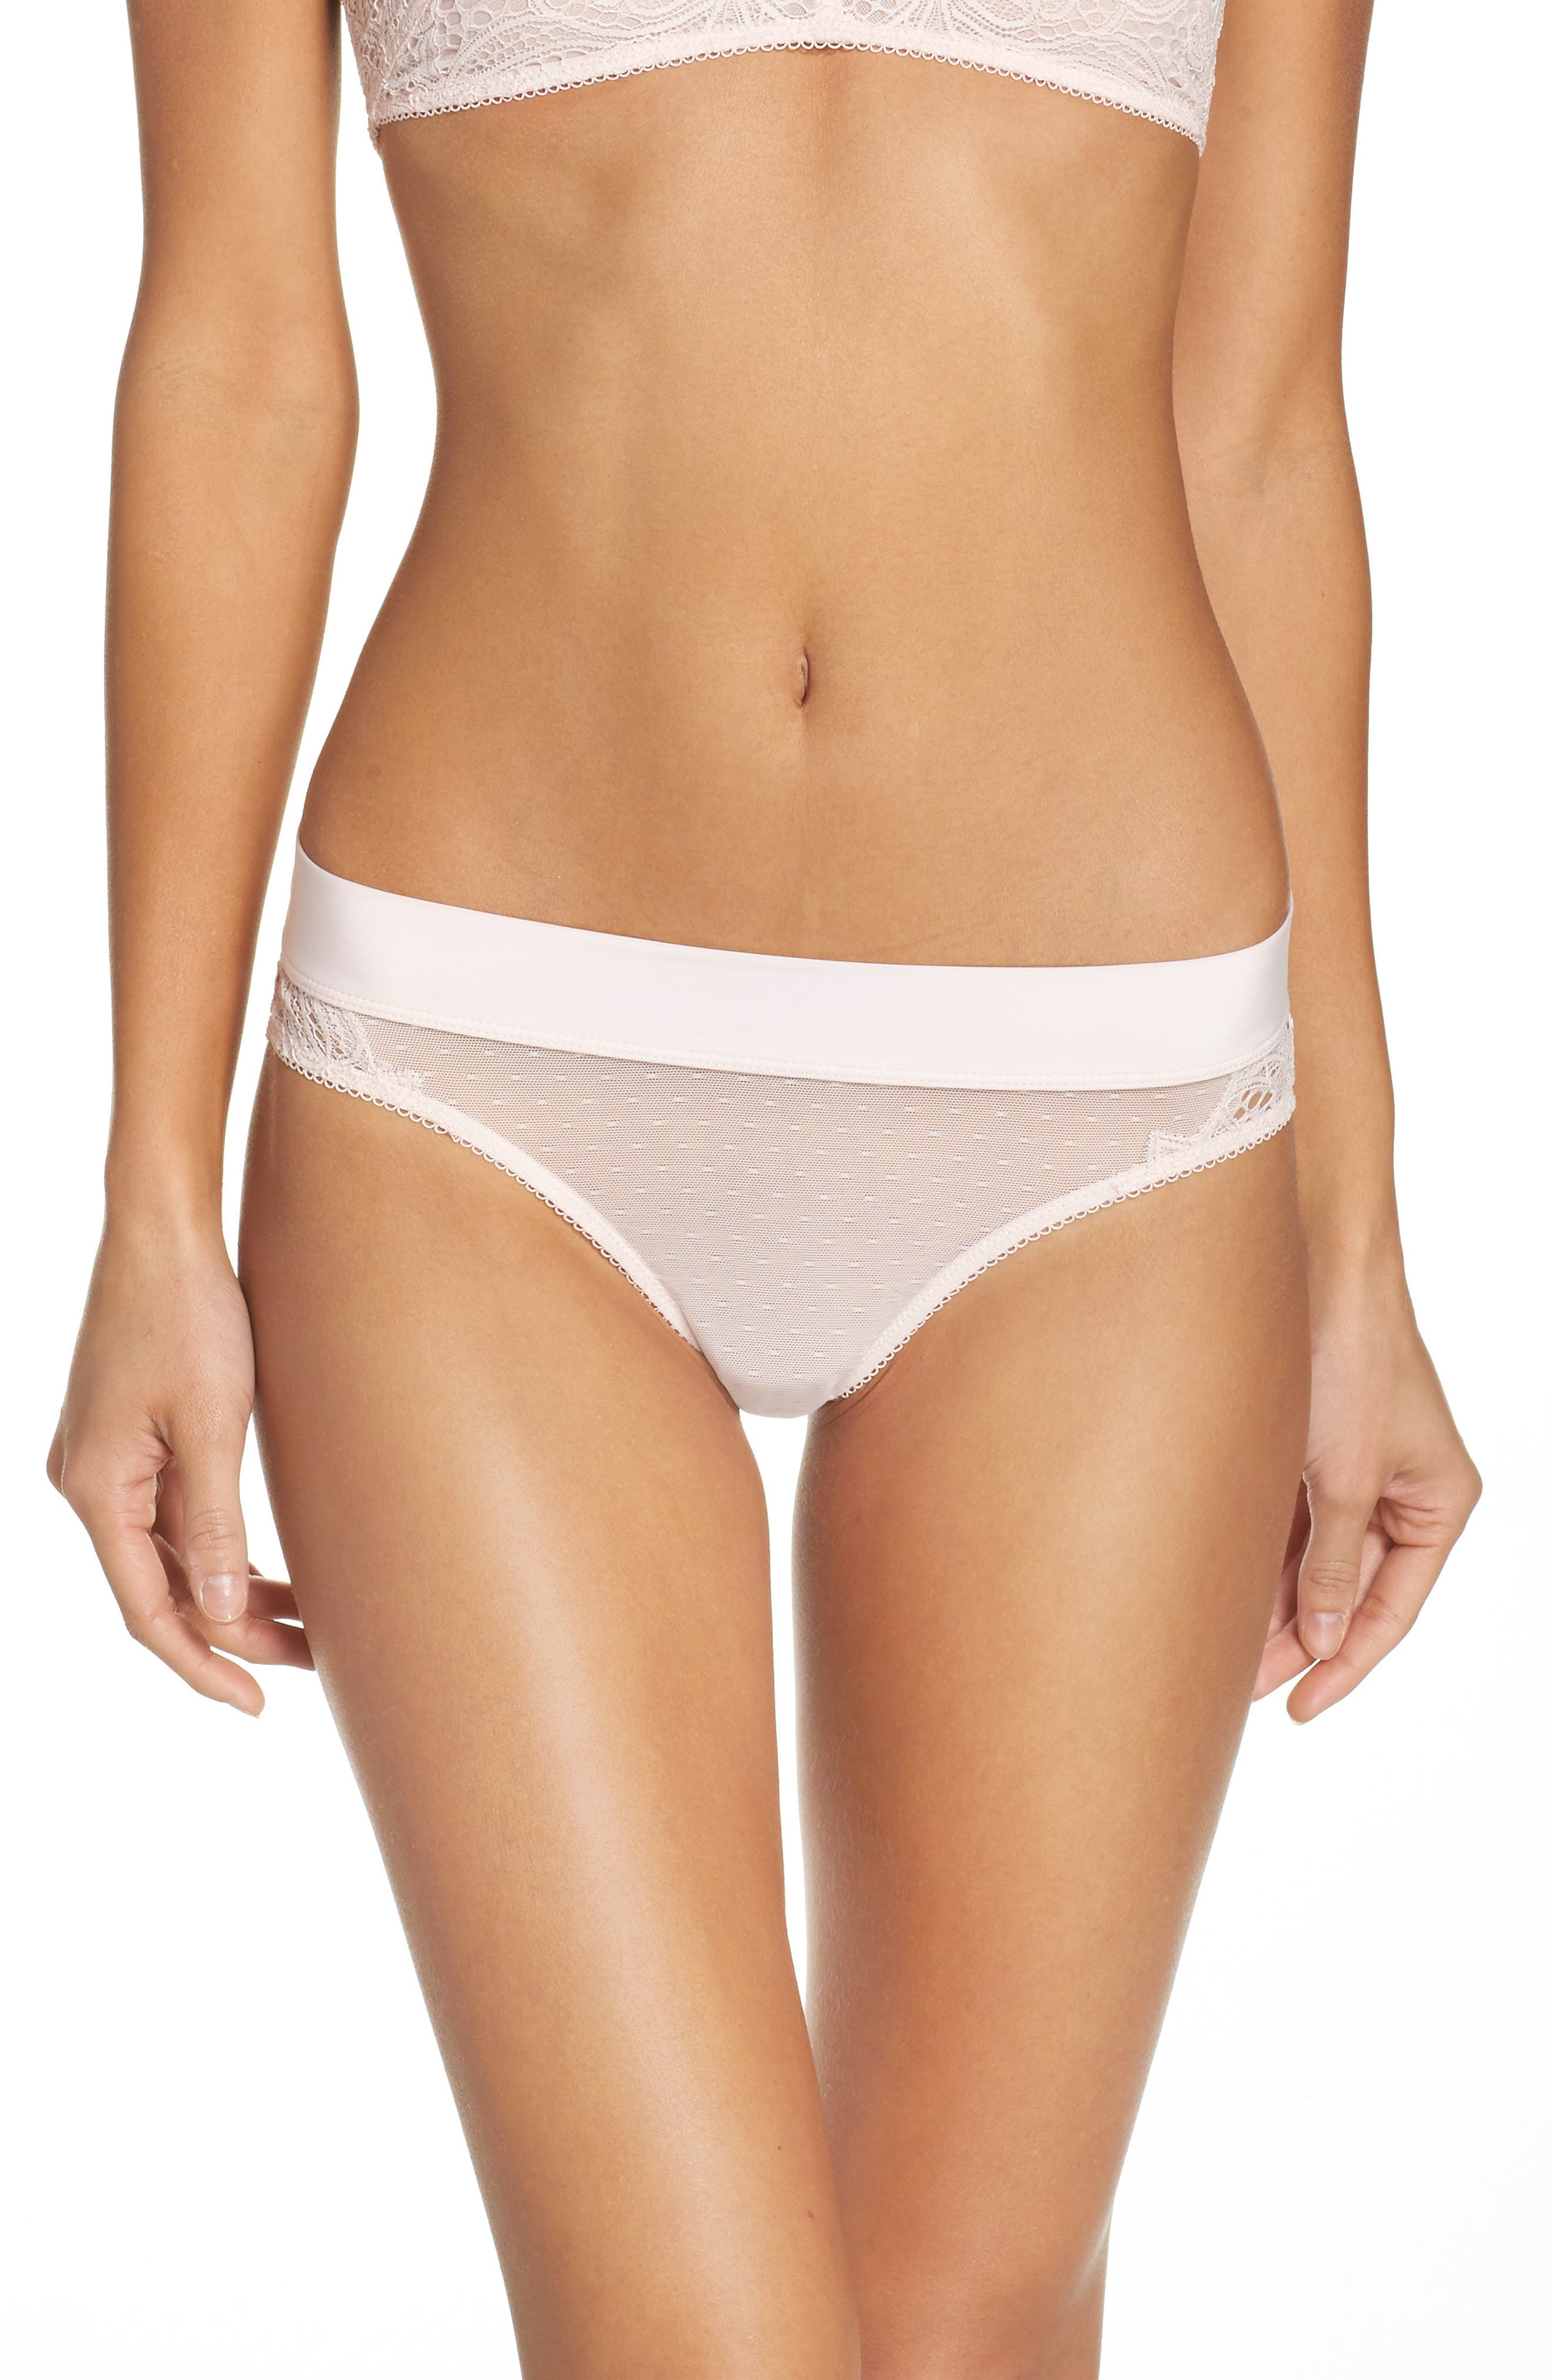 Honeydew Intimates Lace & Mesh Bikini